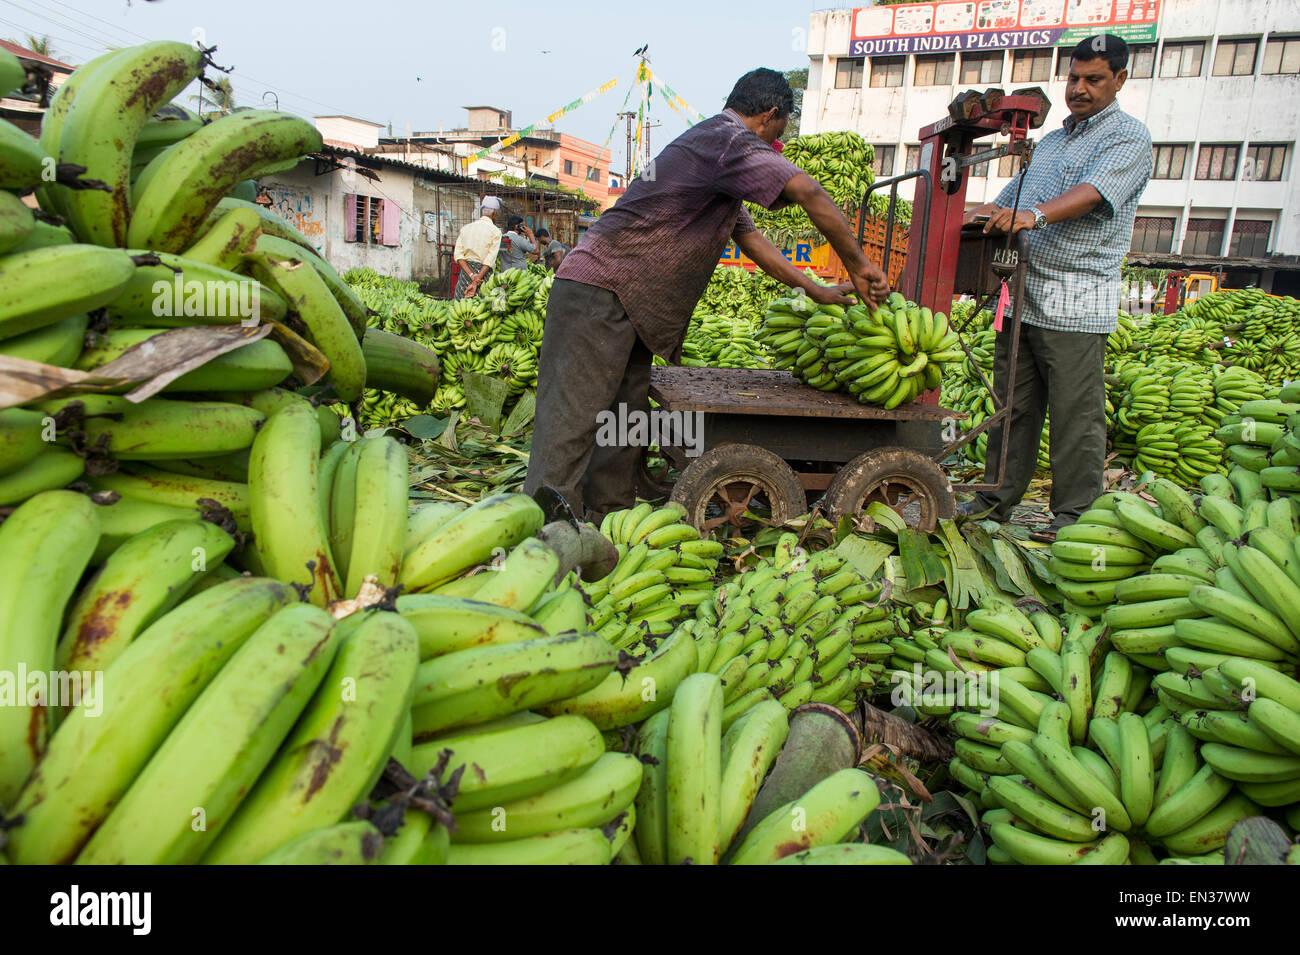 Banana sellers and workers weighing bananas on Broadway Market, Ernakulam, Kerala, India - Stock Image